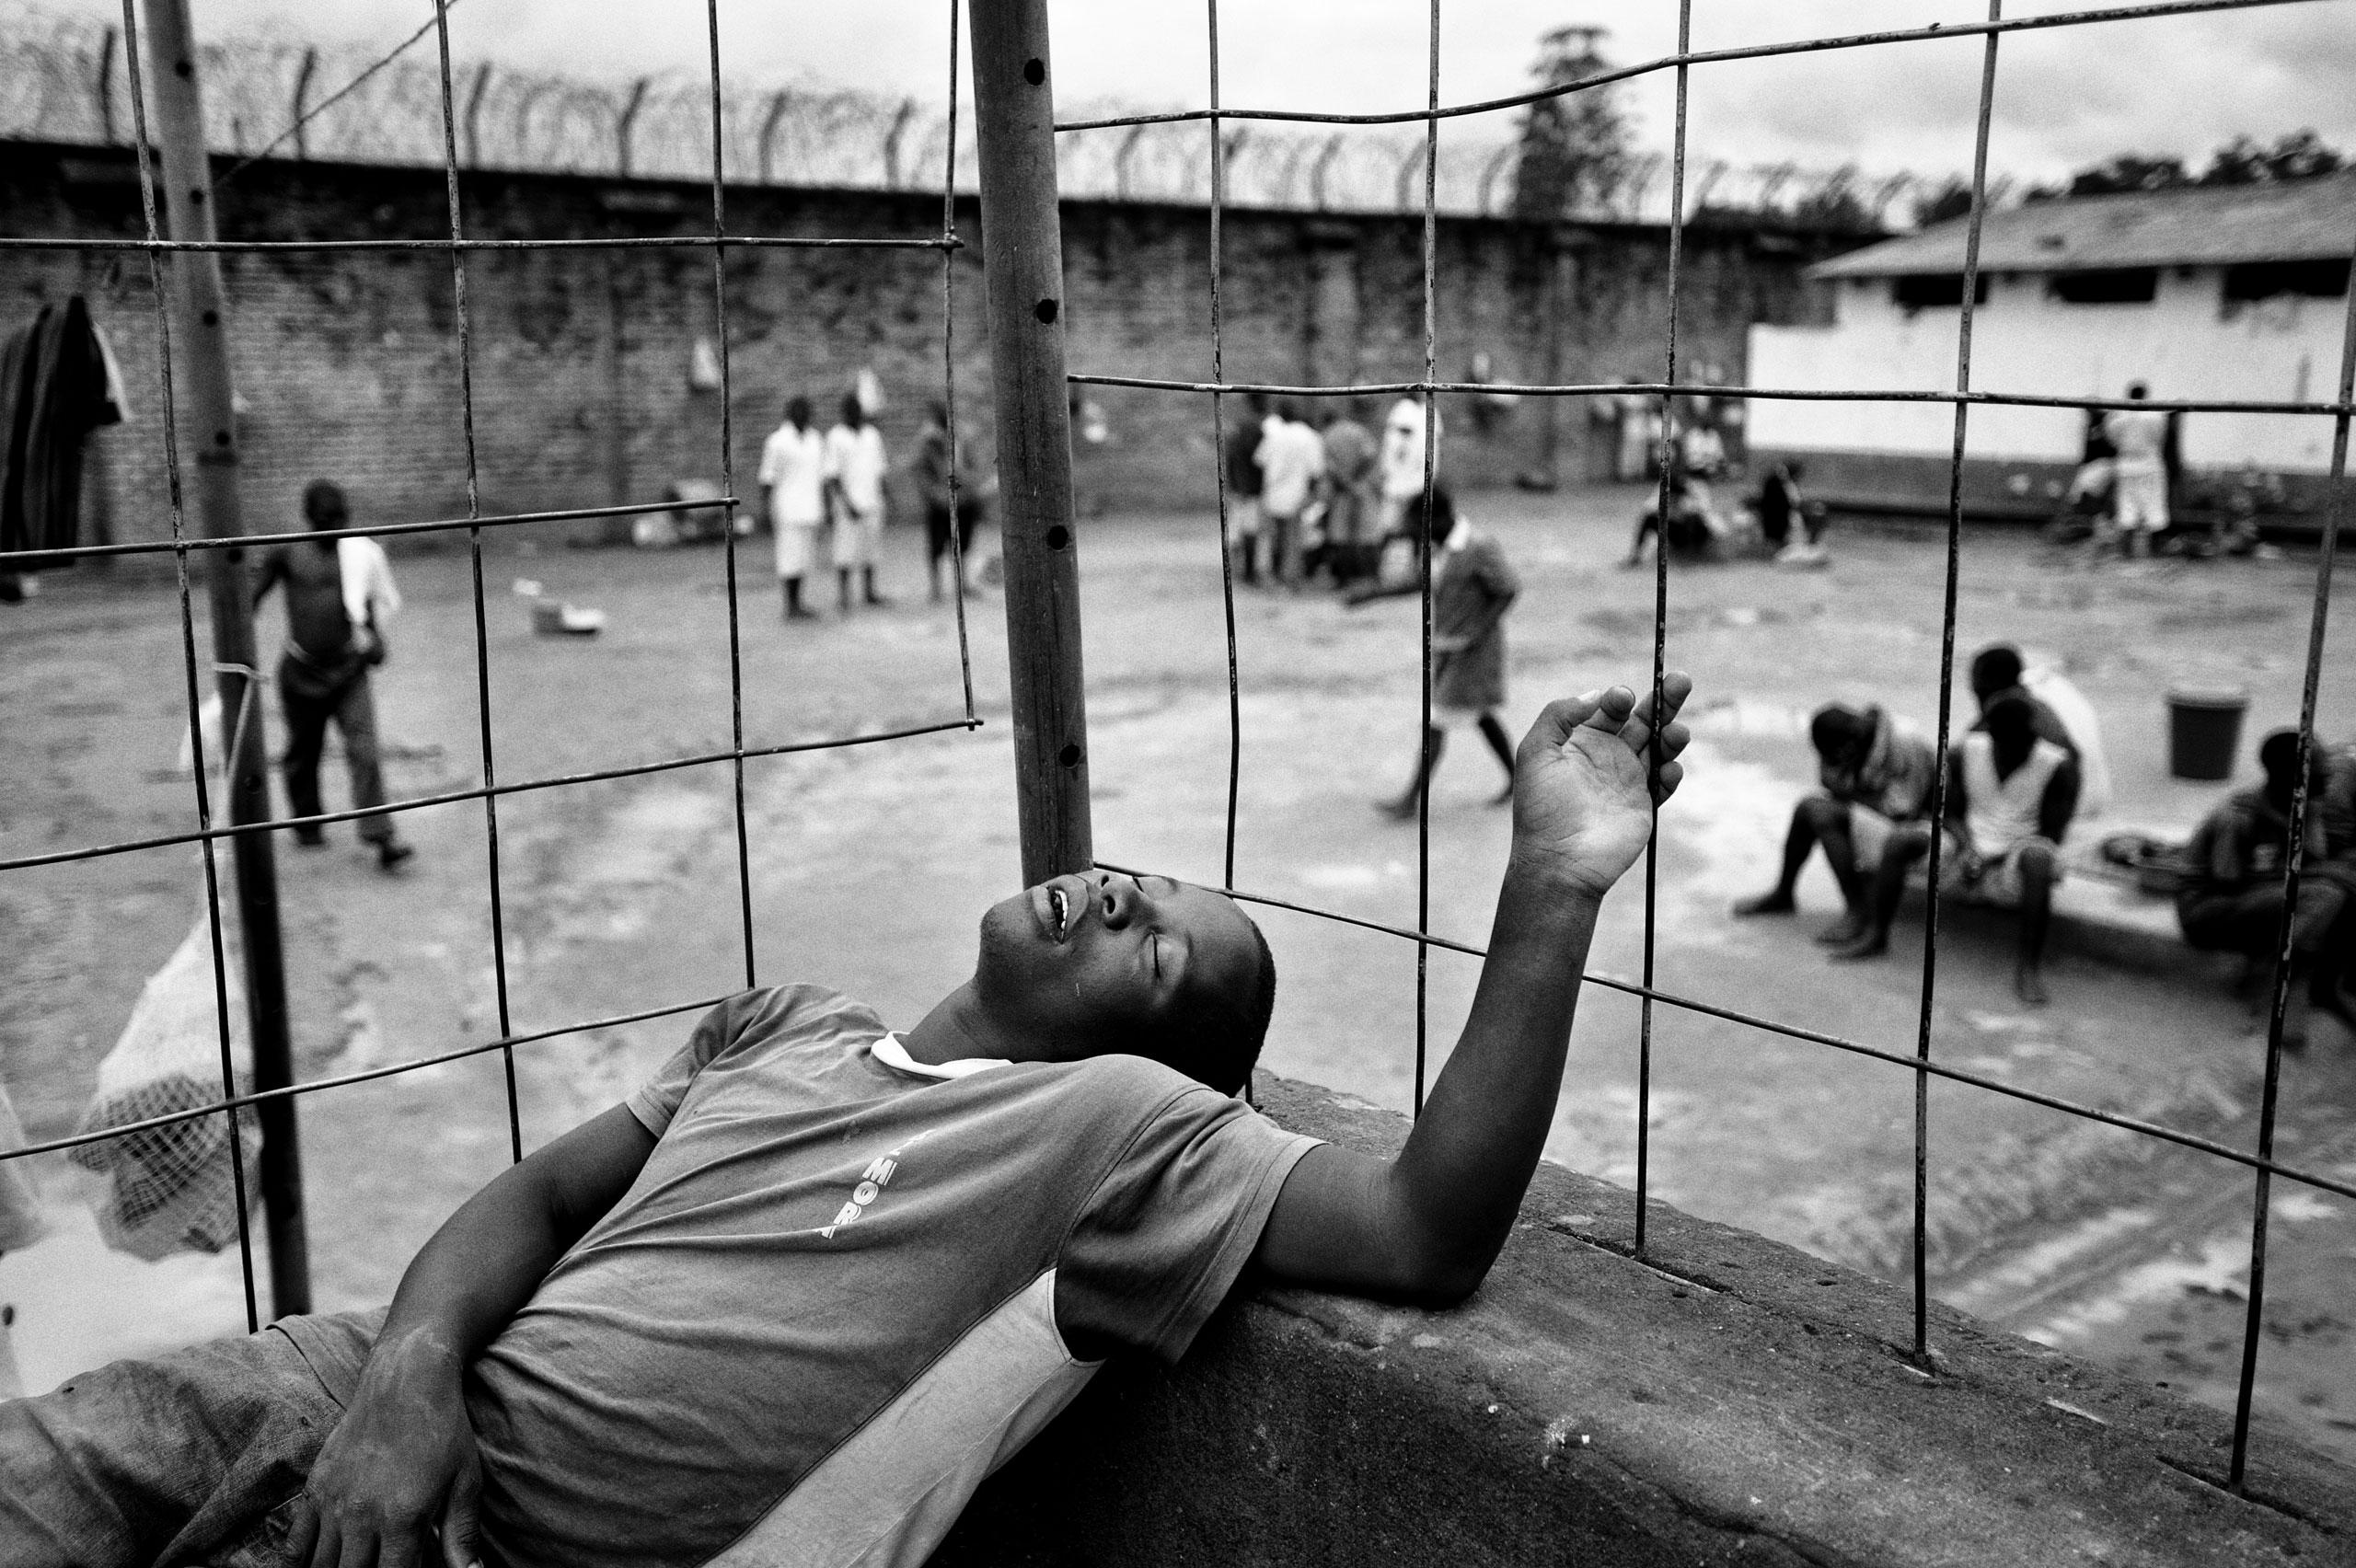 A juvenile prisoner takes a nap.